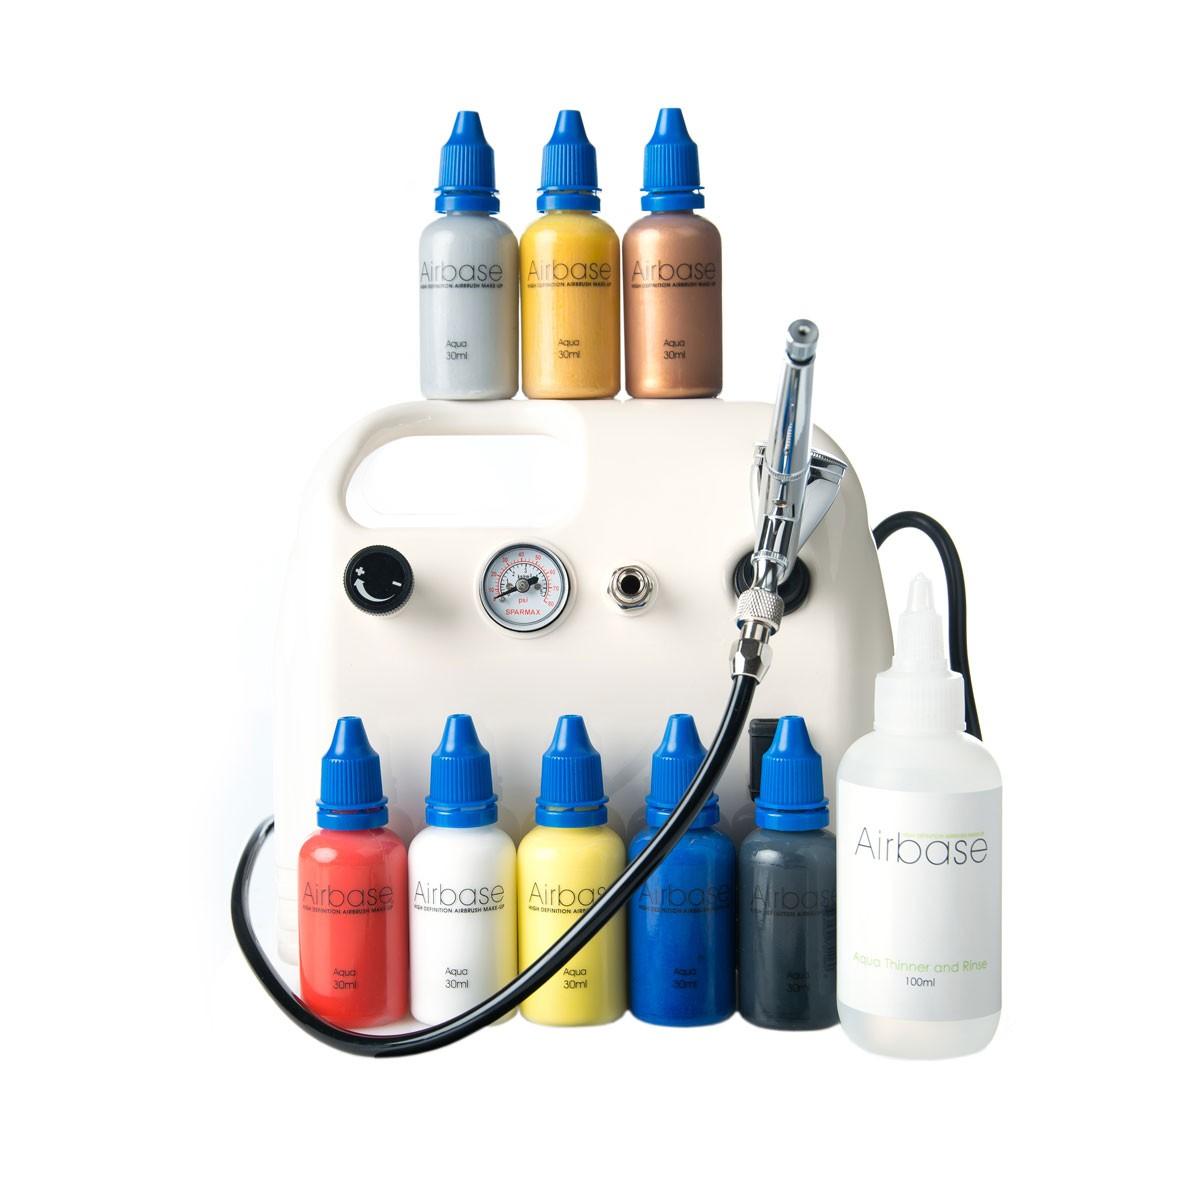 Airbrush Body Art Kit - 8 Primary Colours